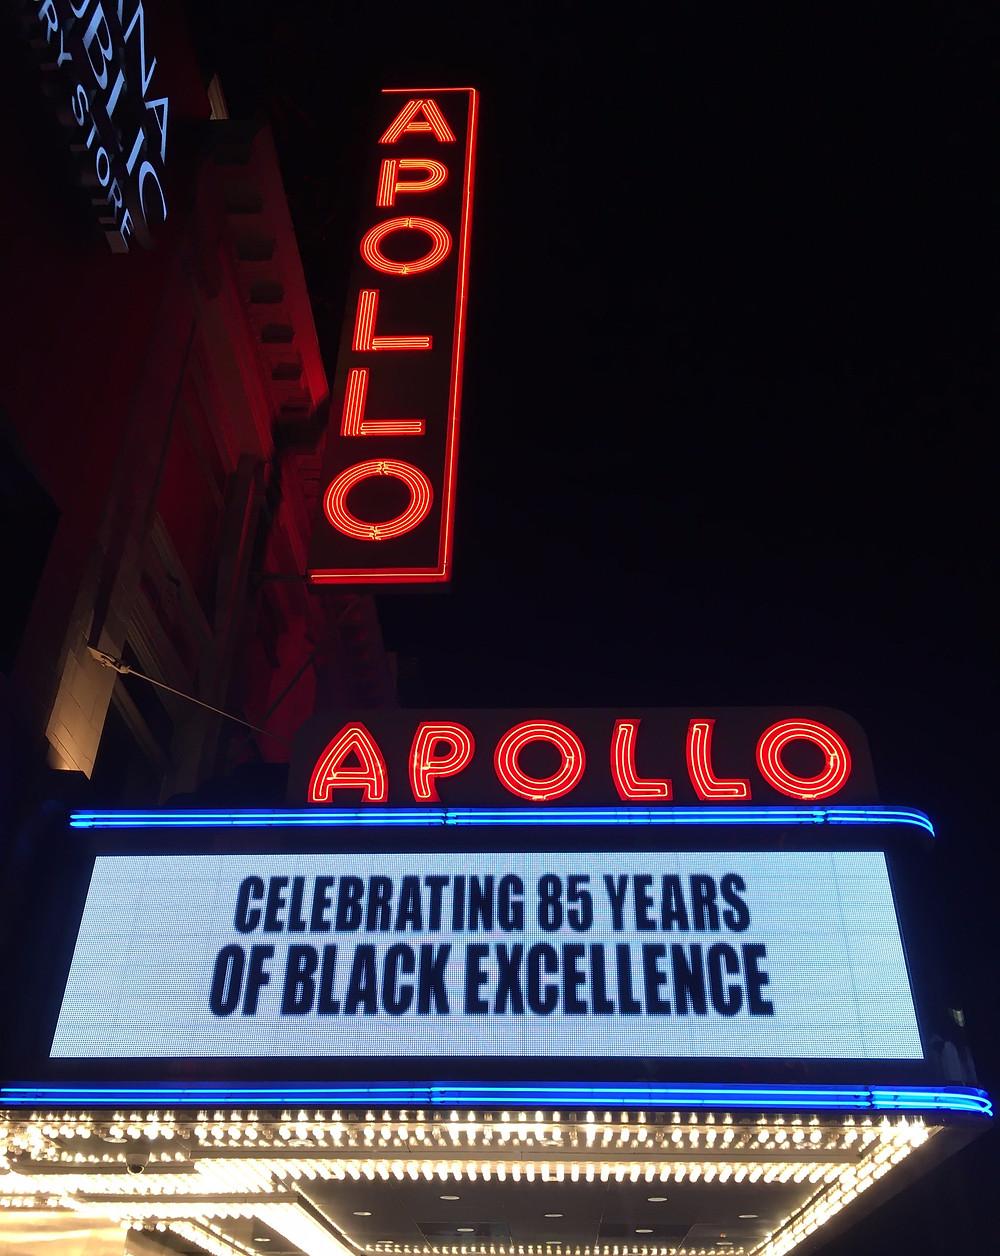 The Apollo's famous neon sign